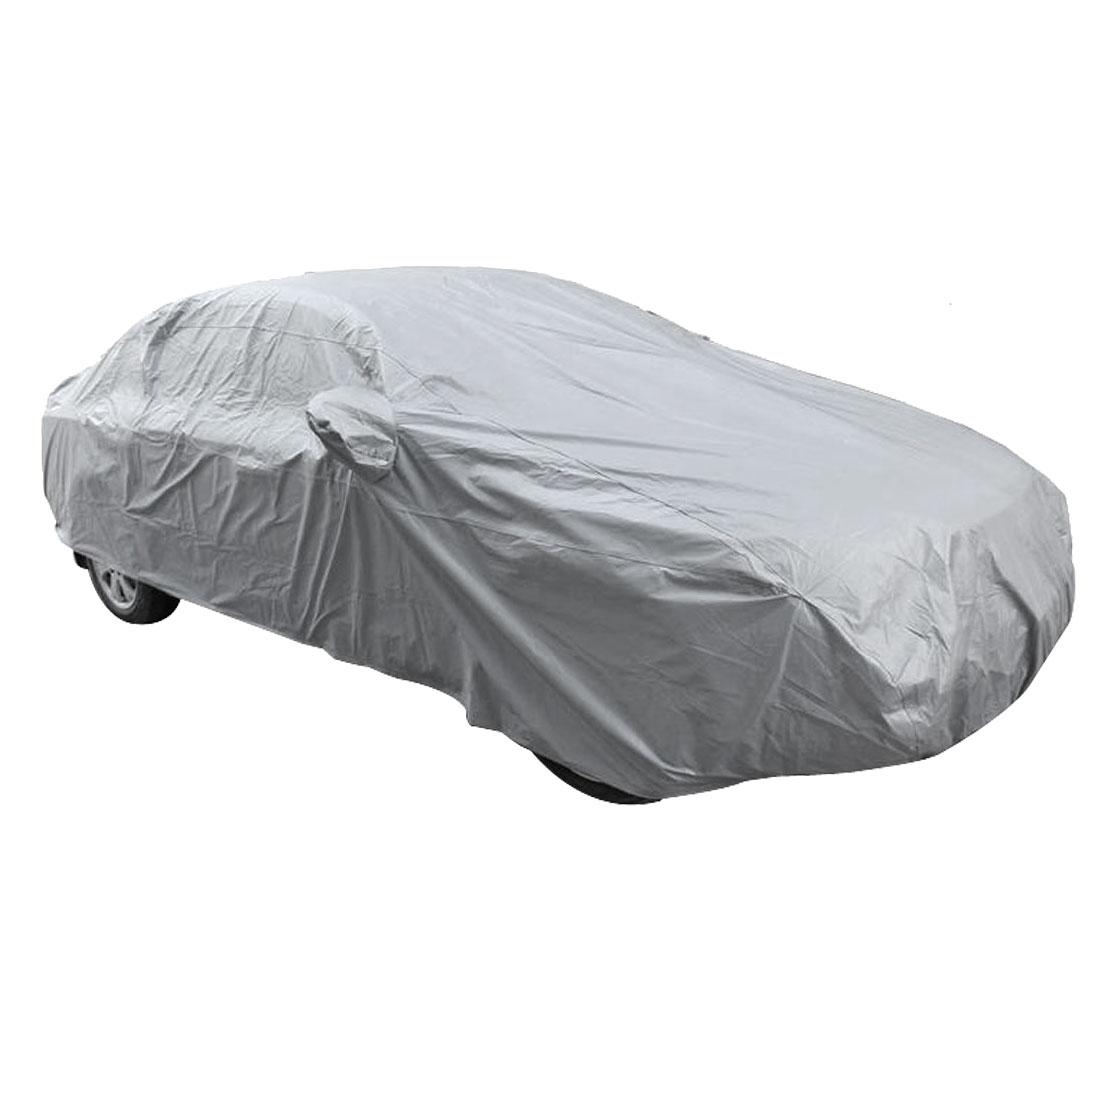 Non-woven Anti-dust Sun Rain Resistant Car Cover Protector for Chevrolet Cruze